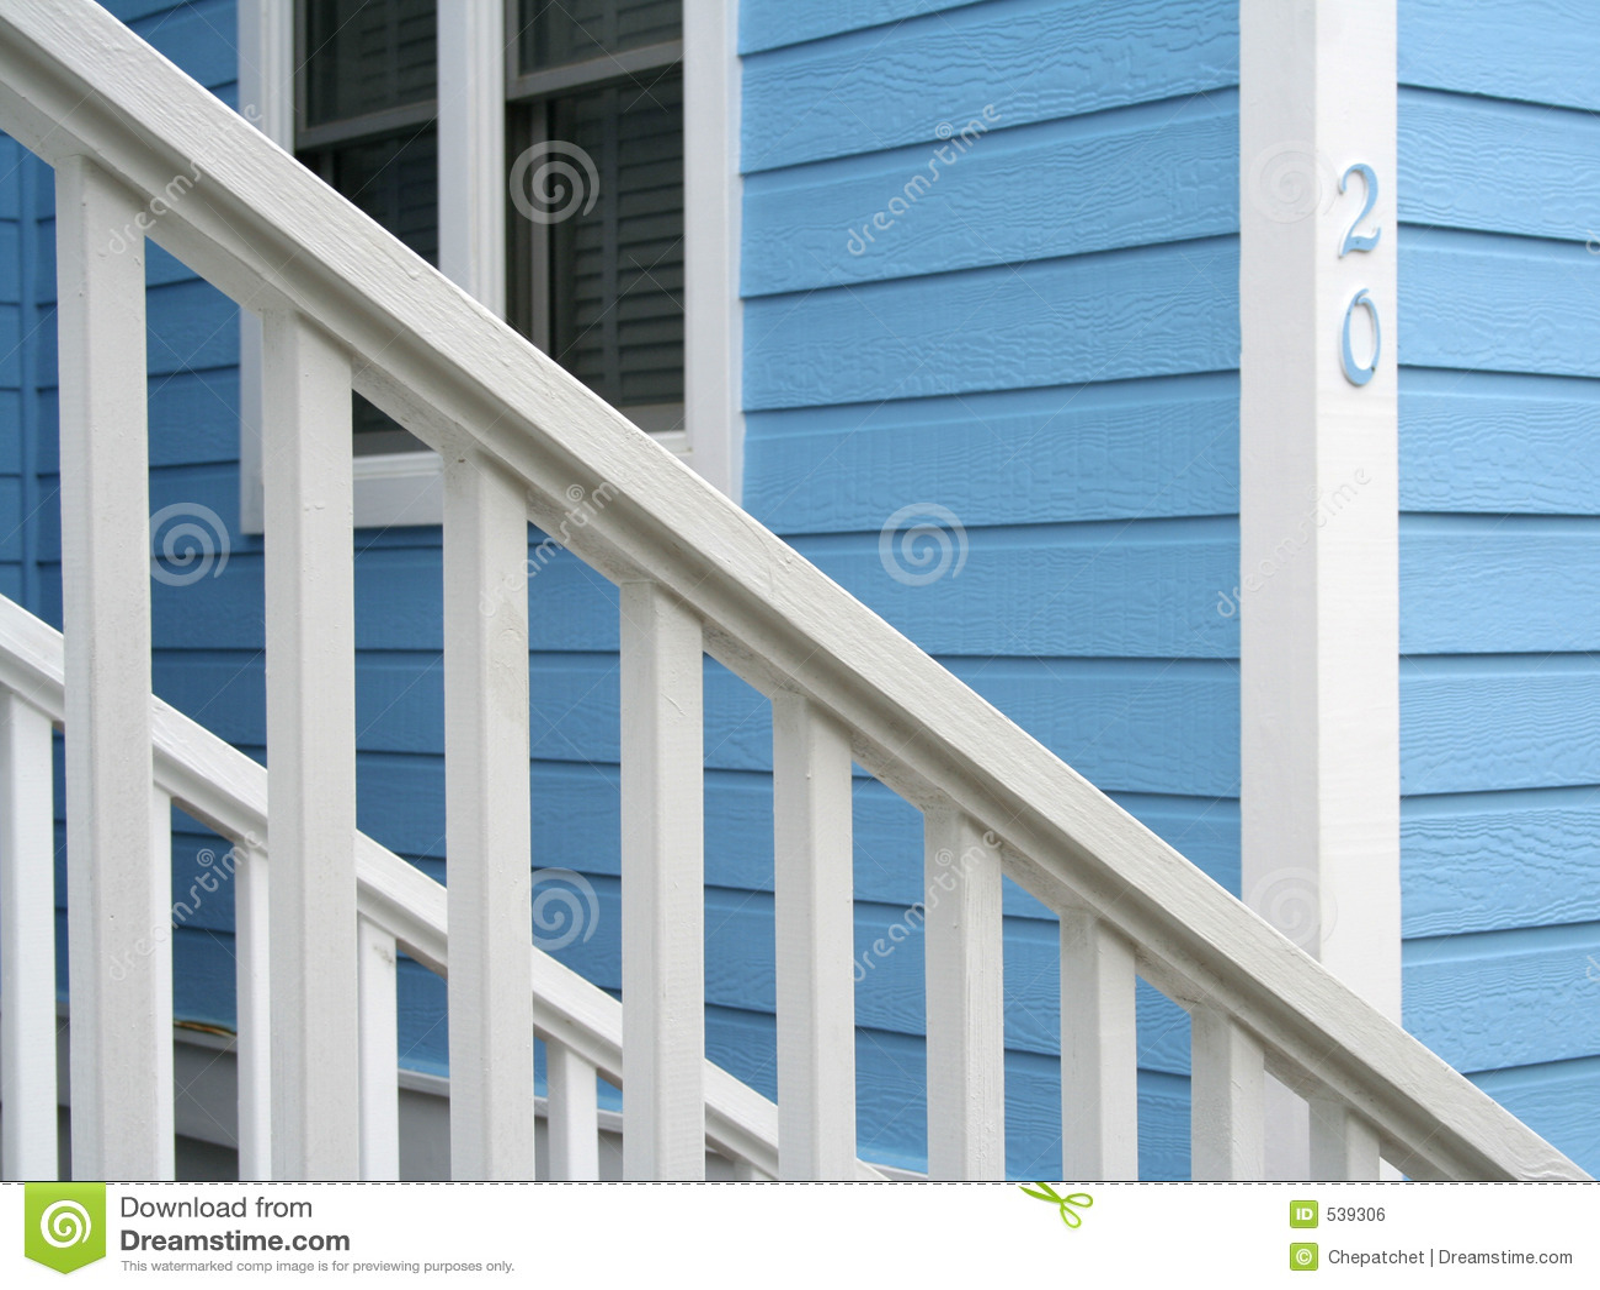 Download Beachhouse角落 库存照片. 图片 包括有 夏天, 视窗, 假期, 租务, 客舱, 成功, 抵押, 绿松石 - 539306